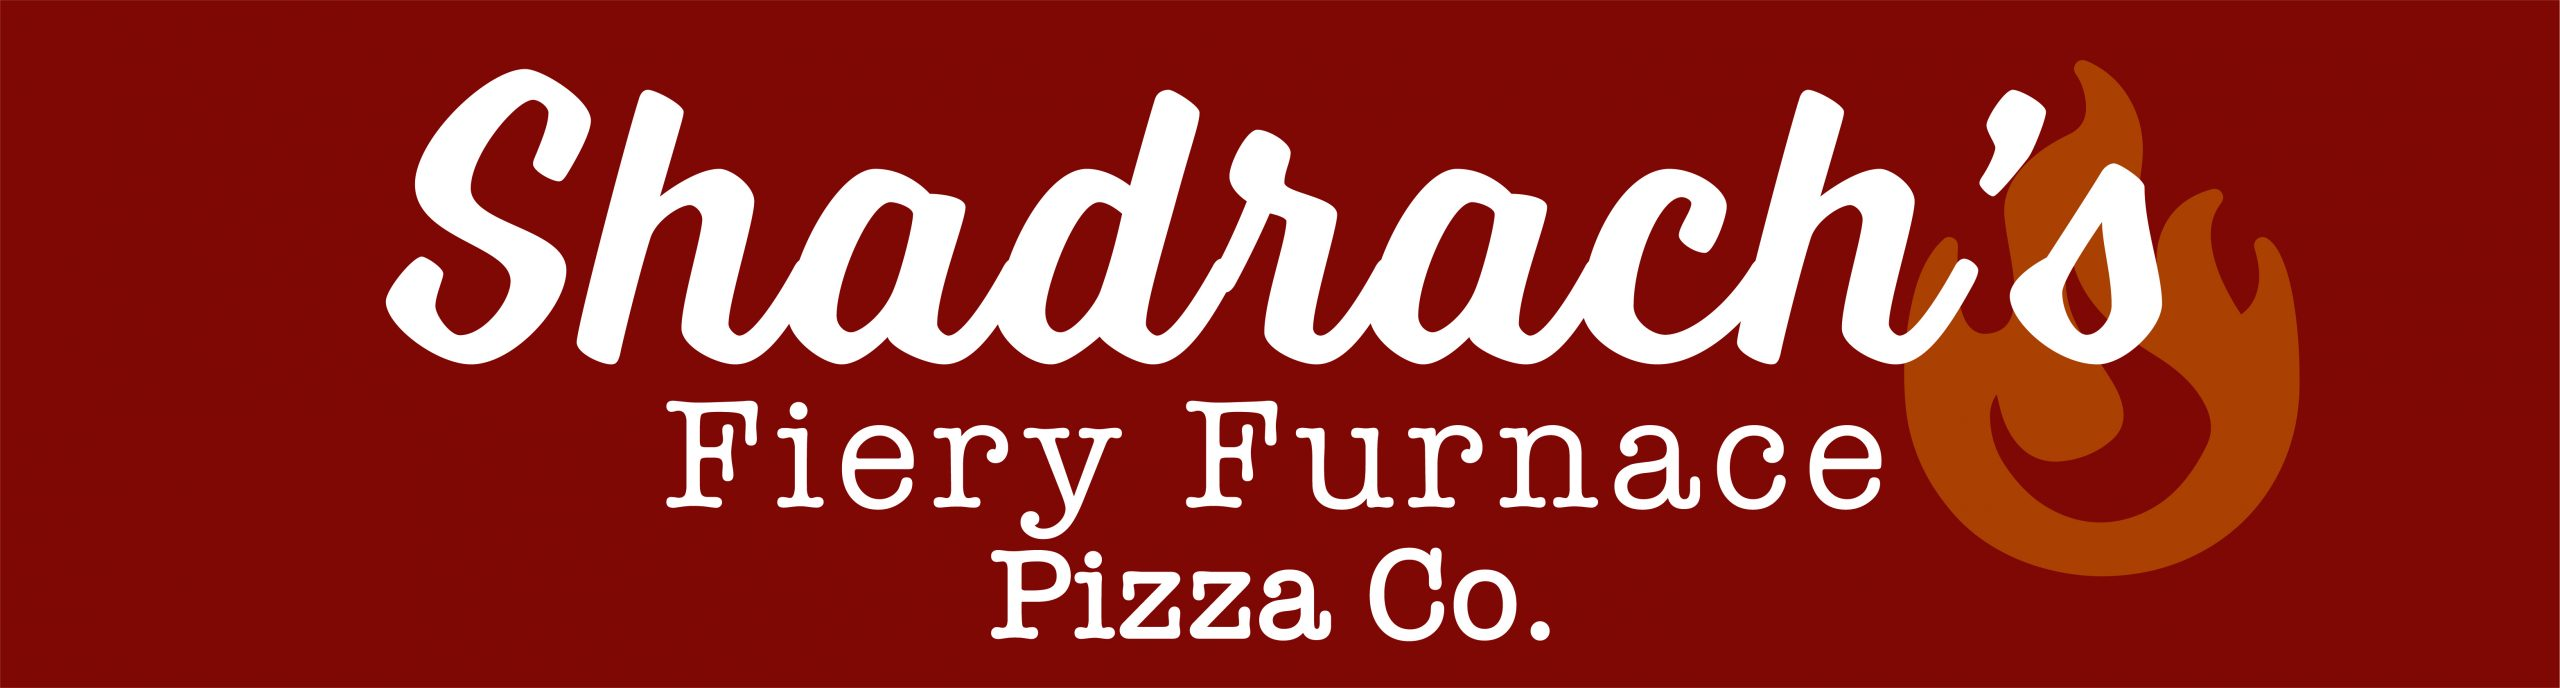 Logo for Shadrach's Fiery Furnace Pizza Co.